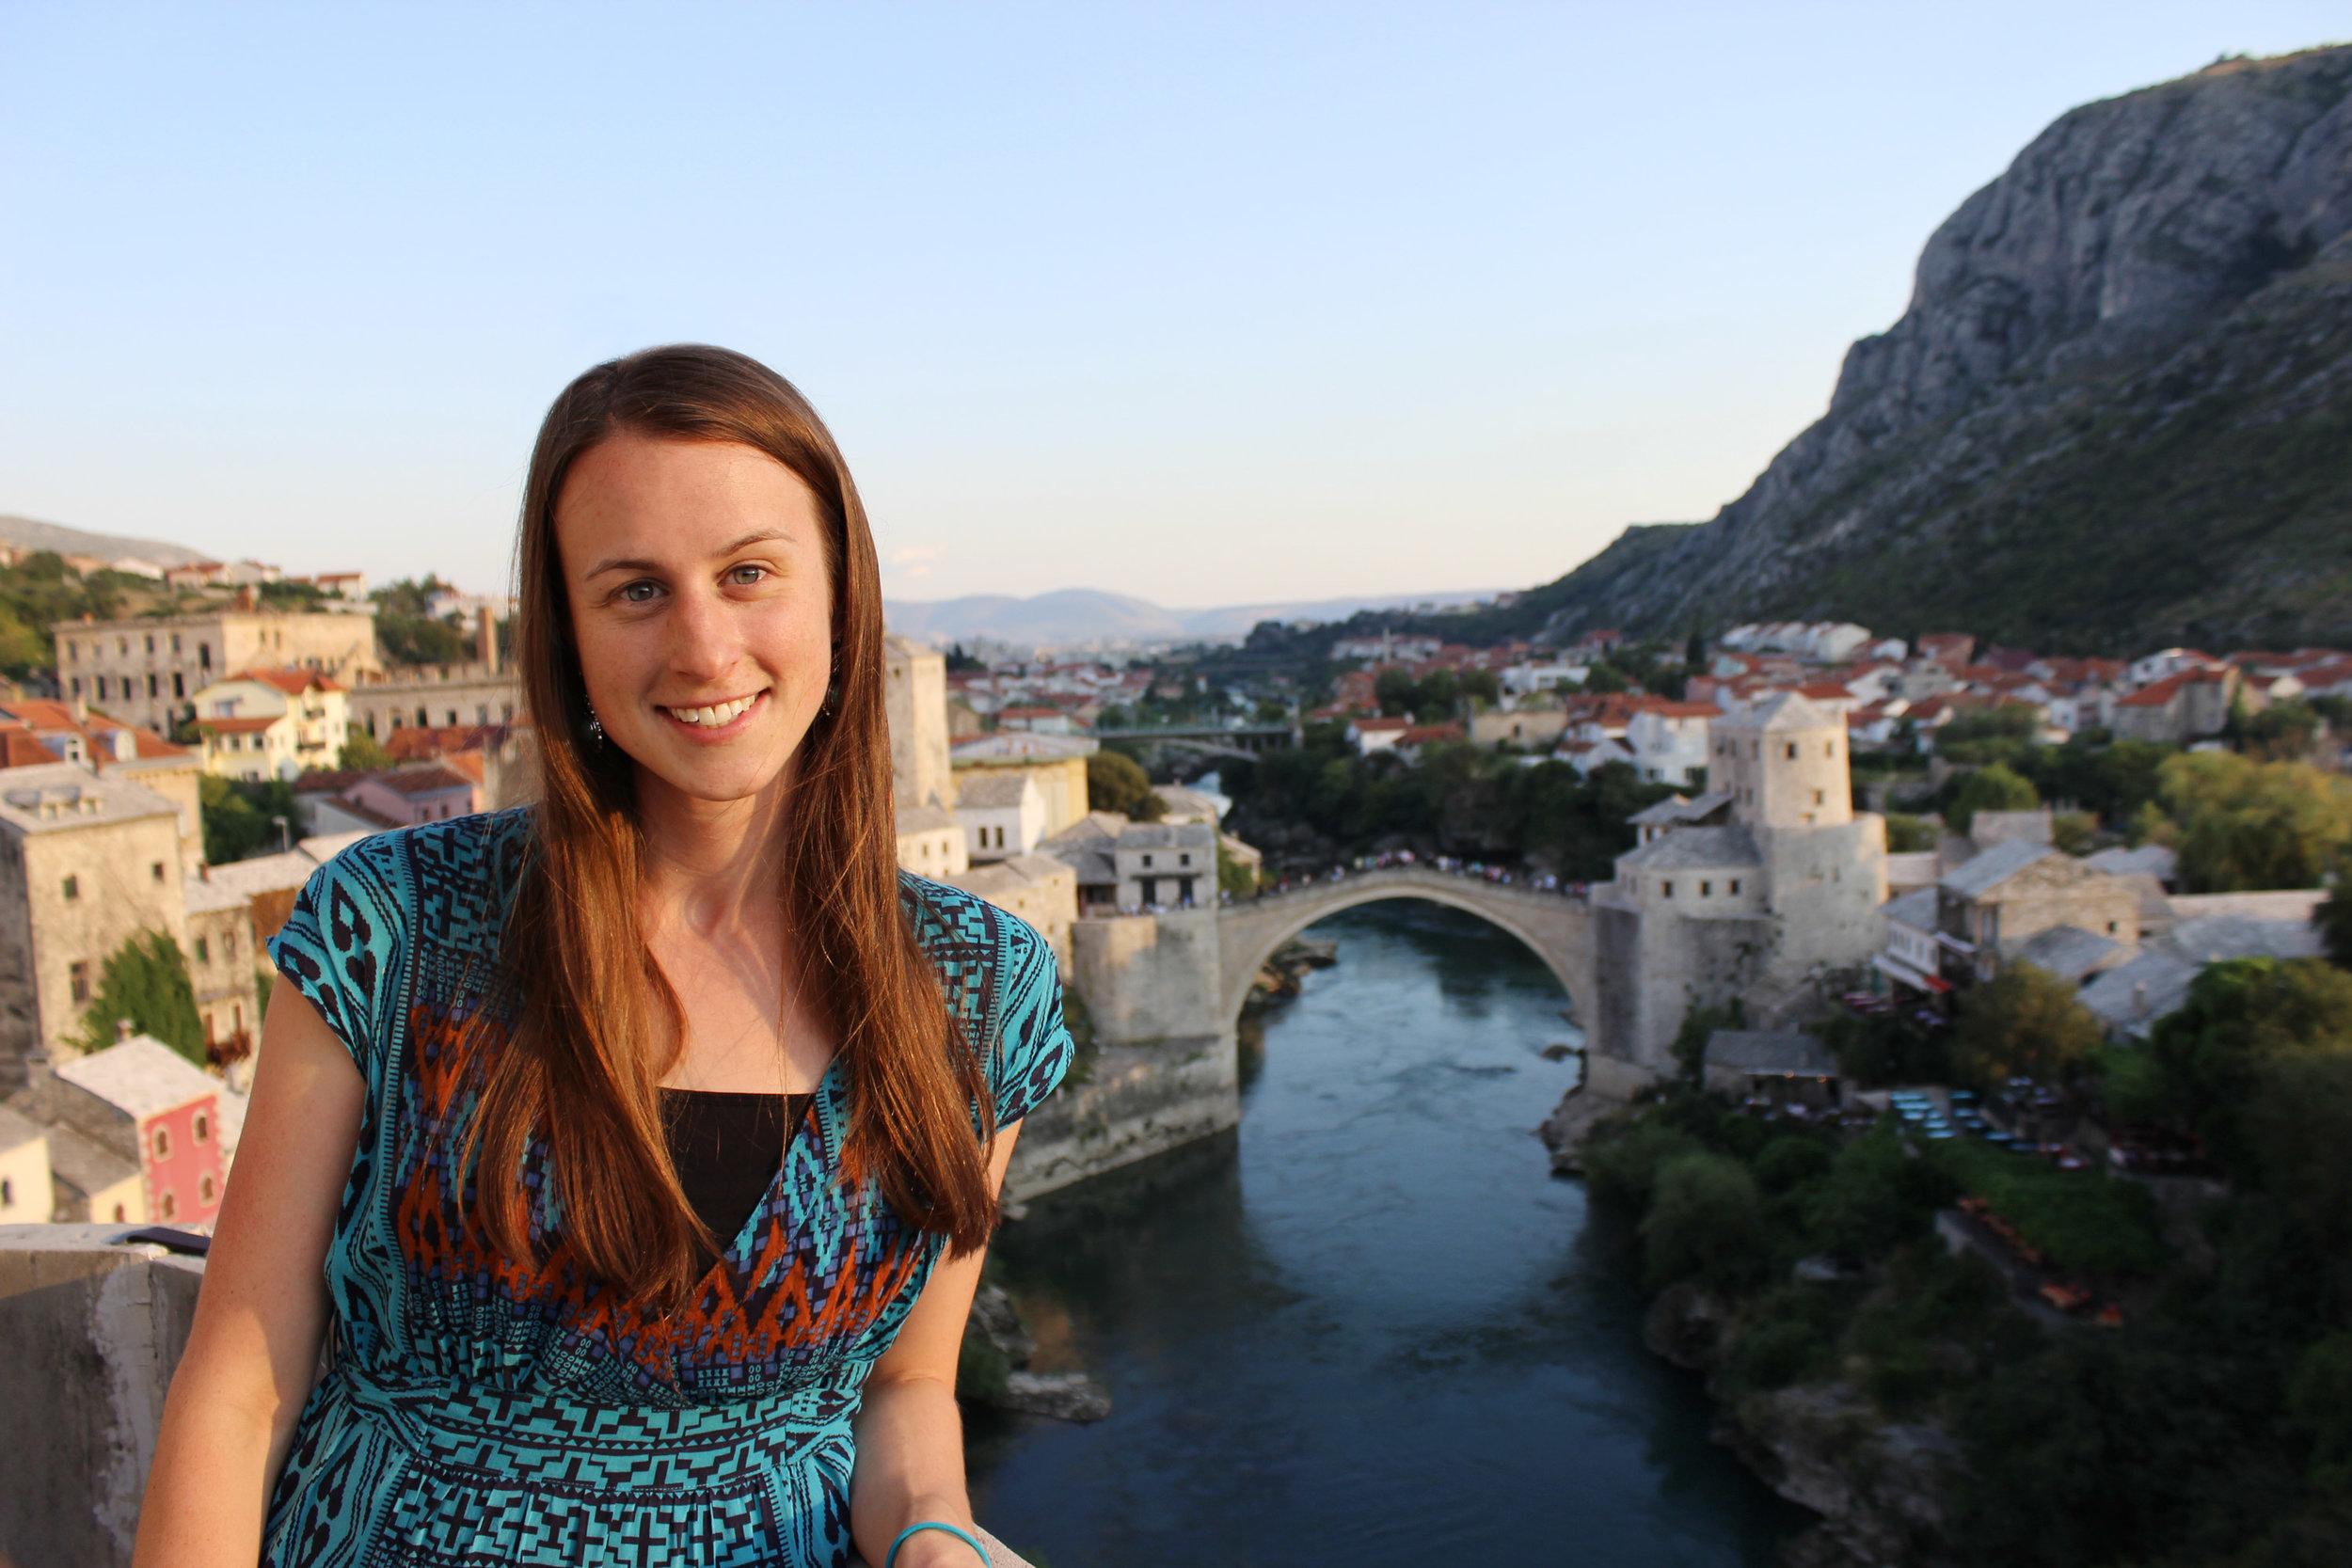 Gwen-Mostar-Bosnia-and-Herzegovina.jpg